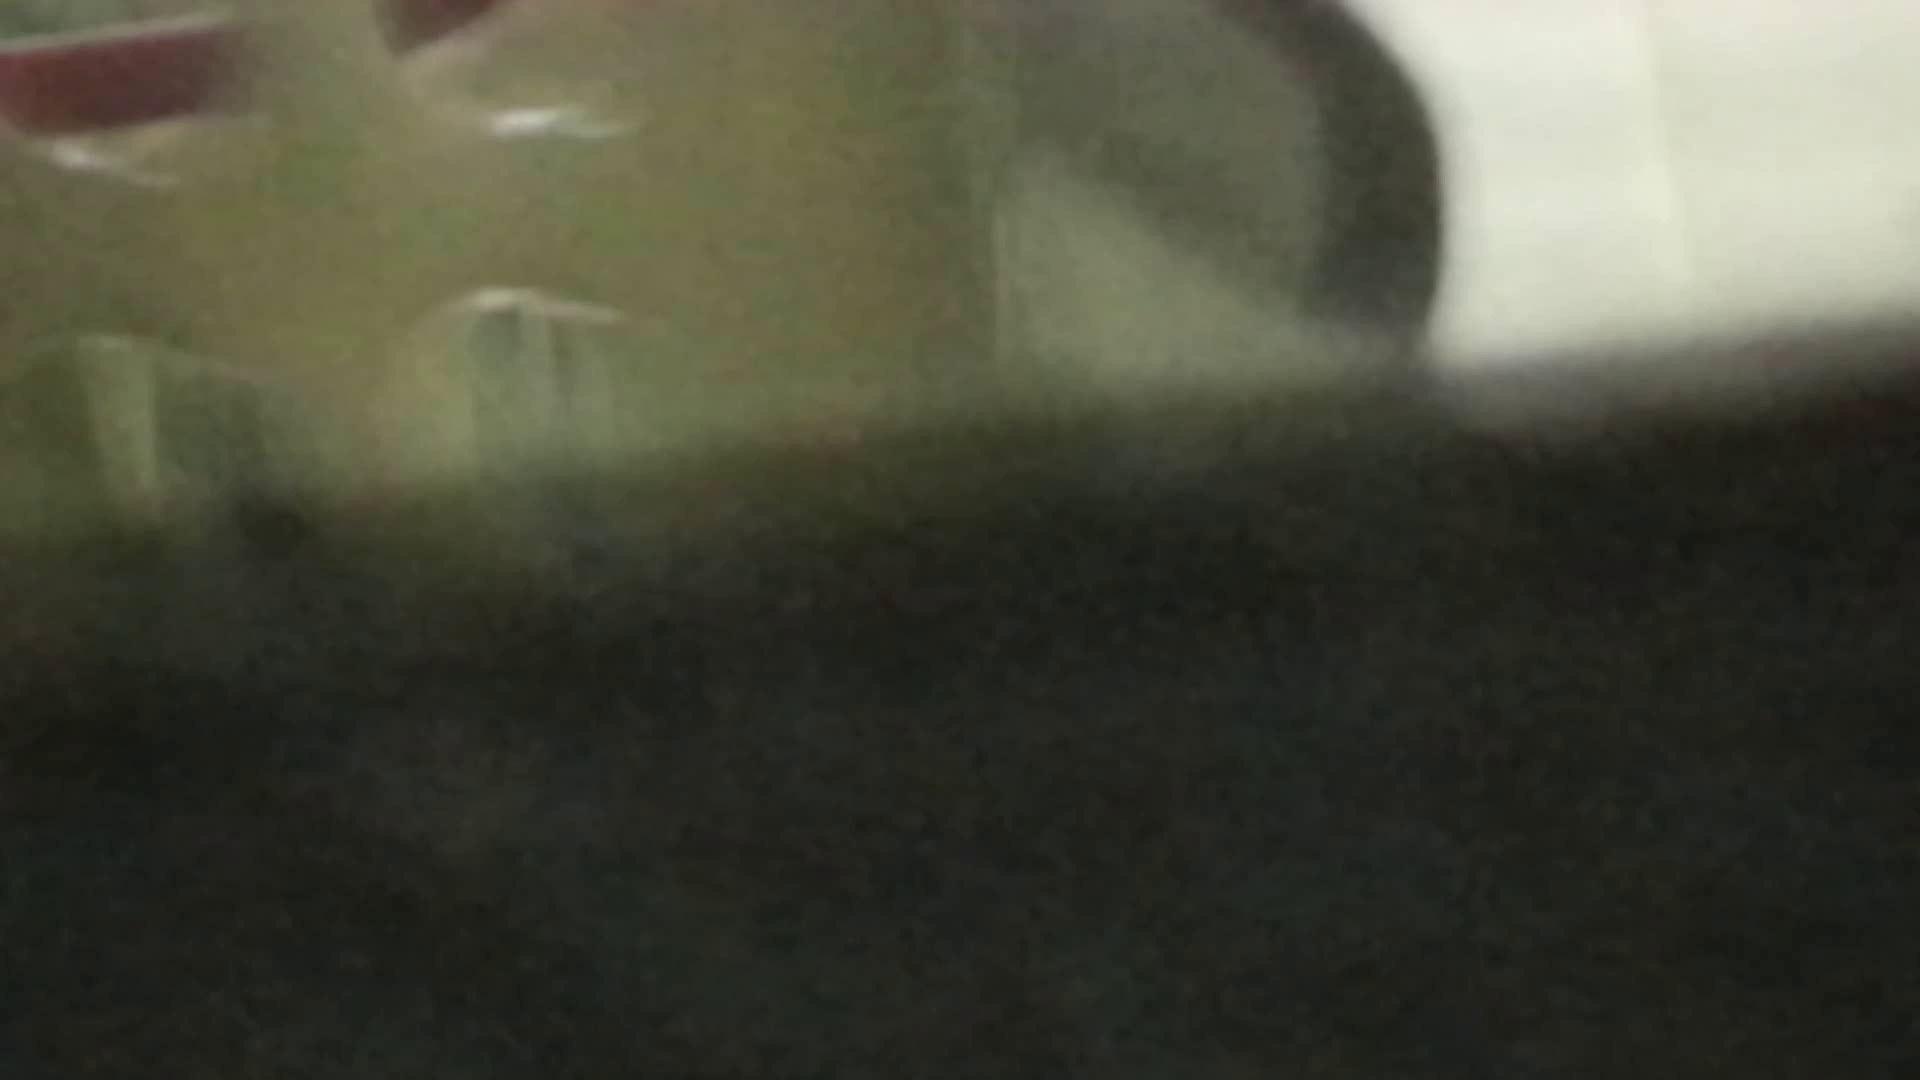 SPYさん初投稿!マンション覗き!5000K!ハイビジョン撮影VOL.05(元サッカー部員社会人) スポーツマン  38pic 27